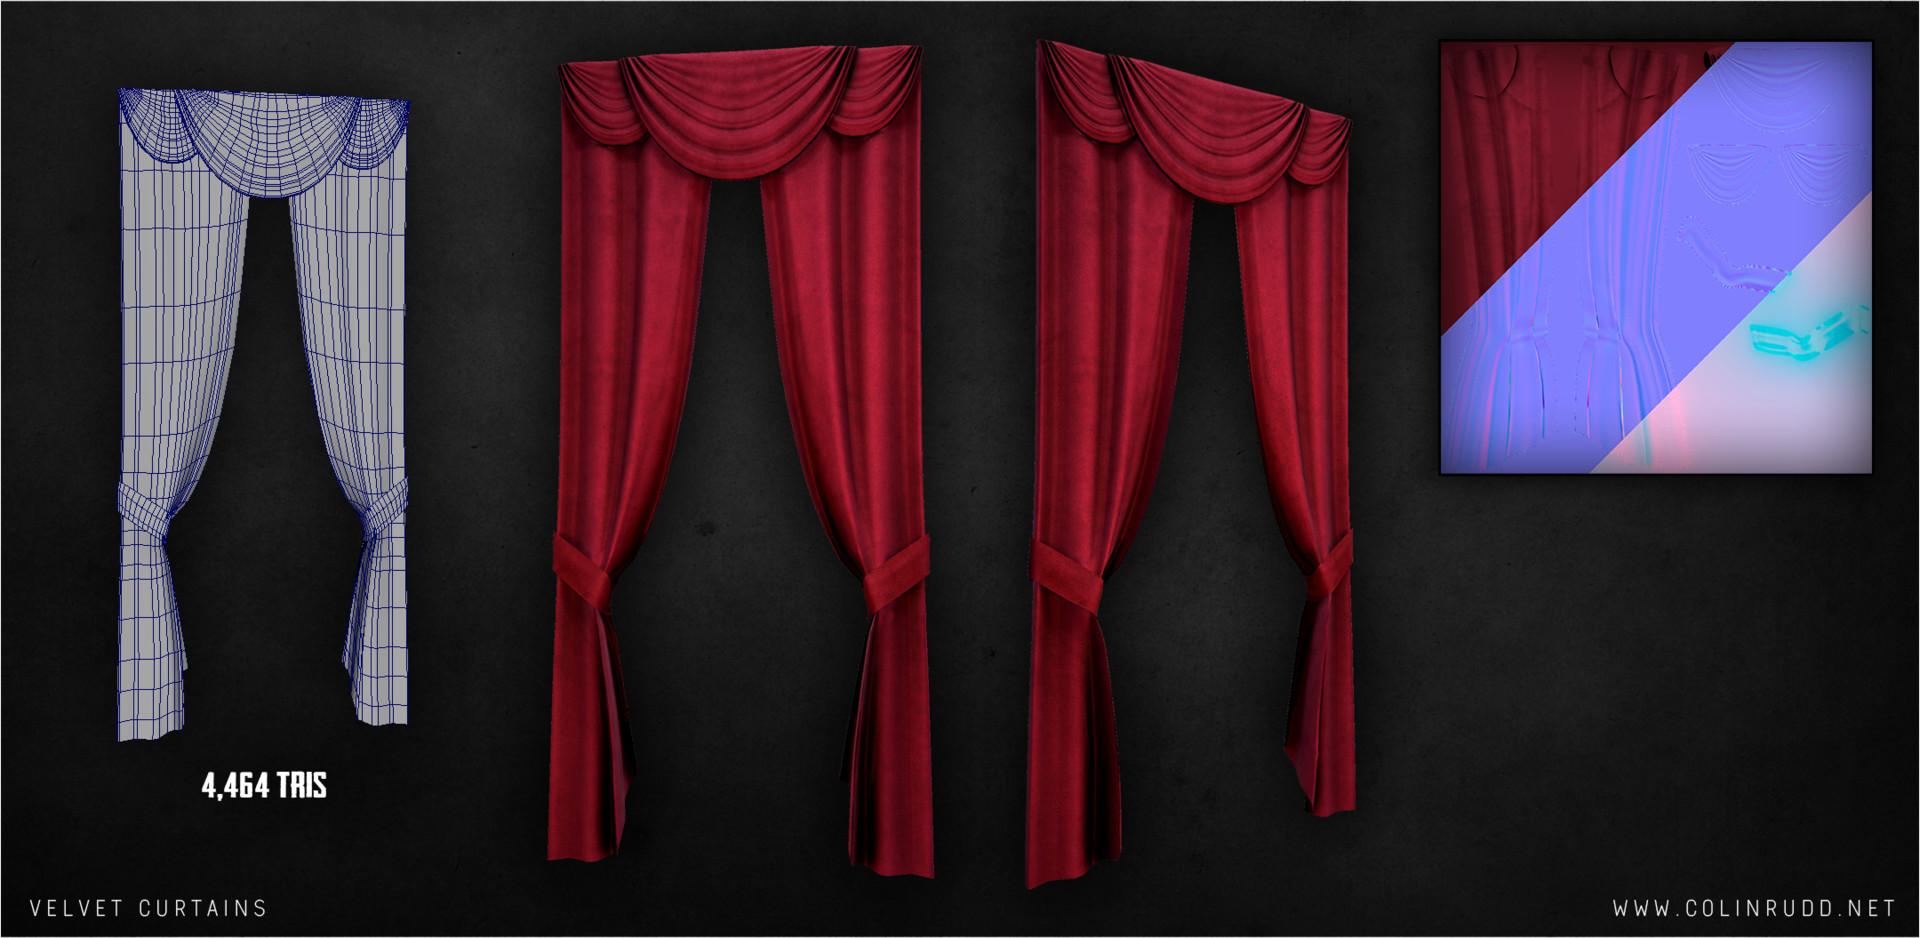 Colin rudd curtain